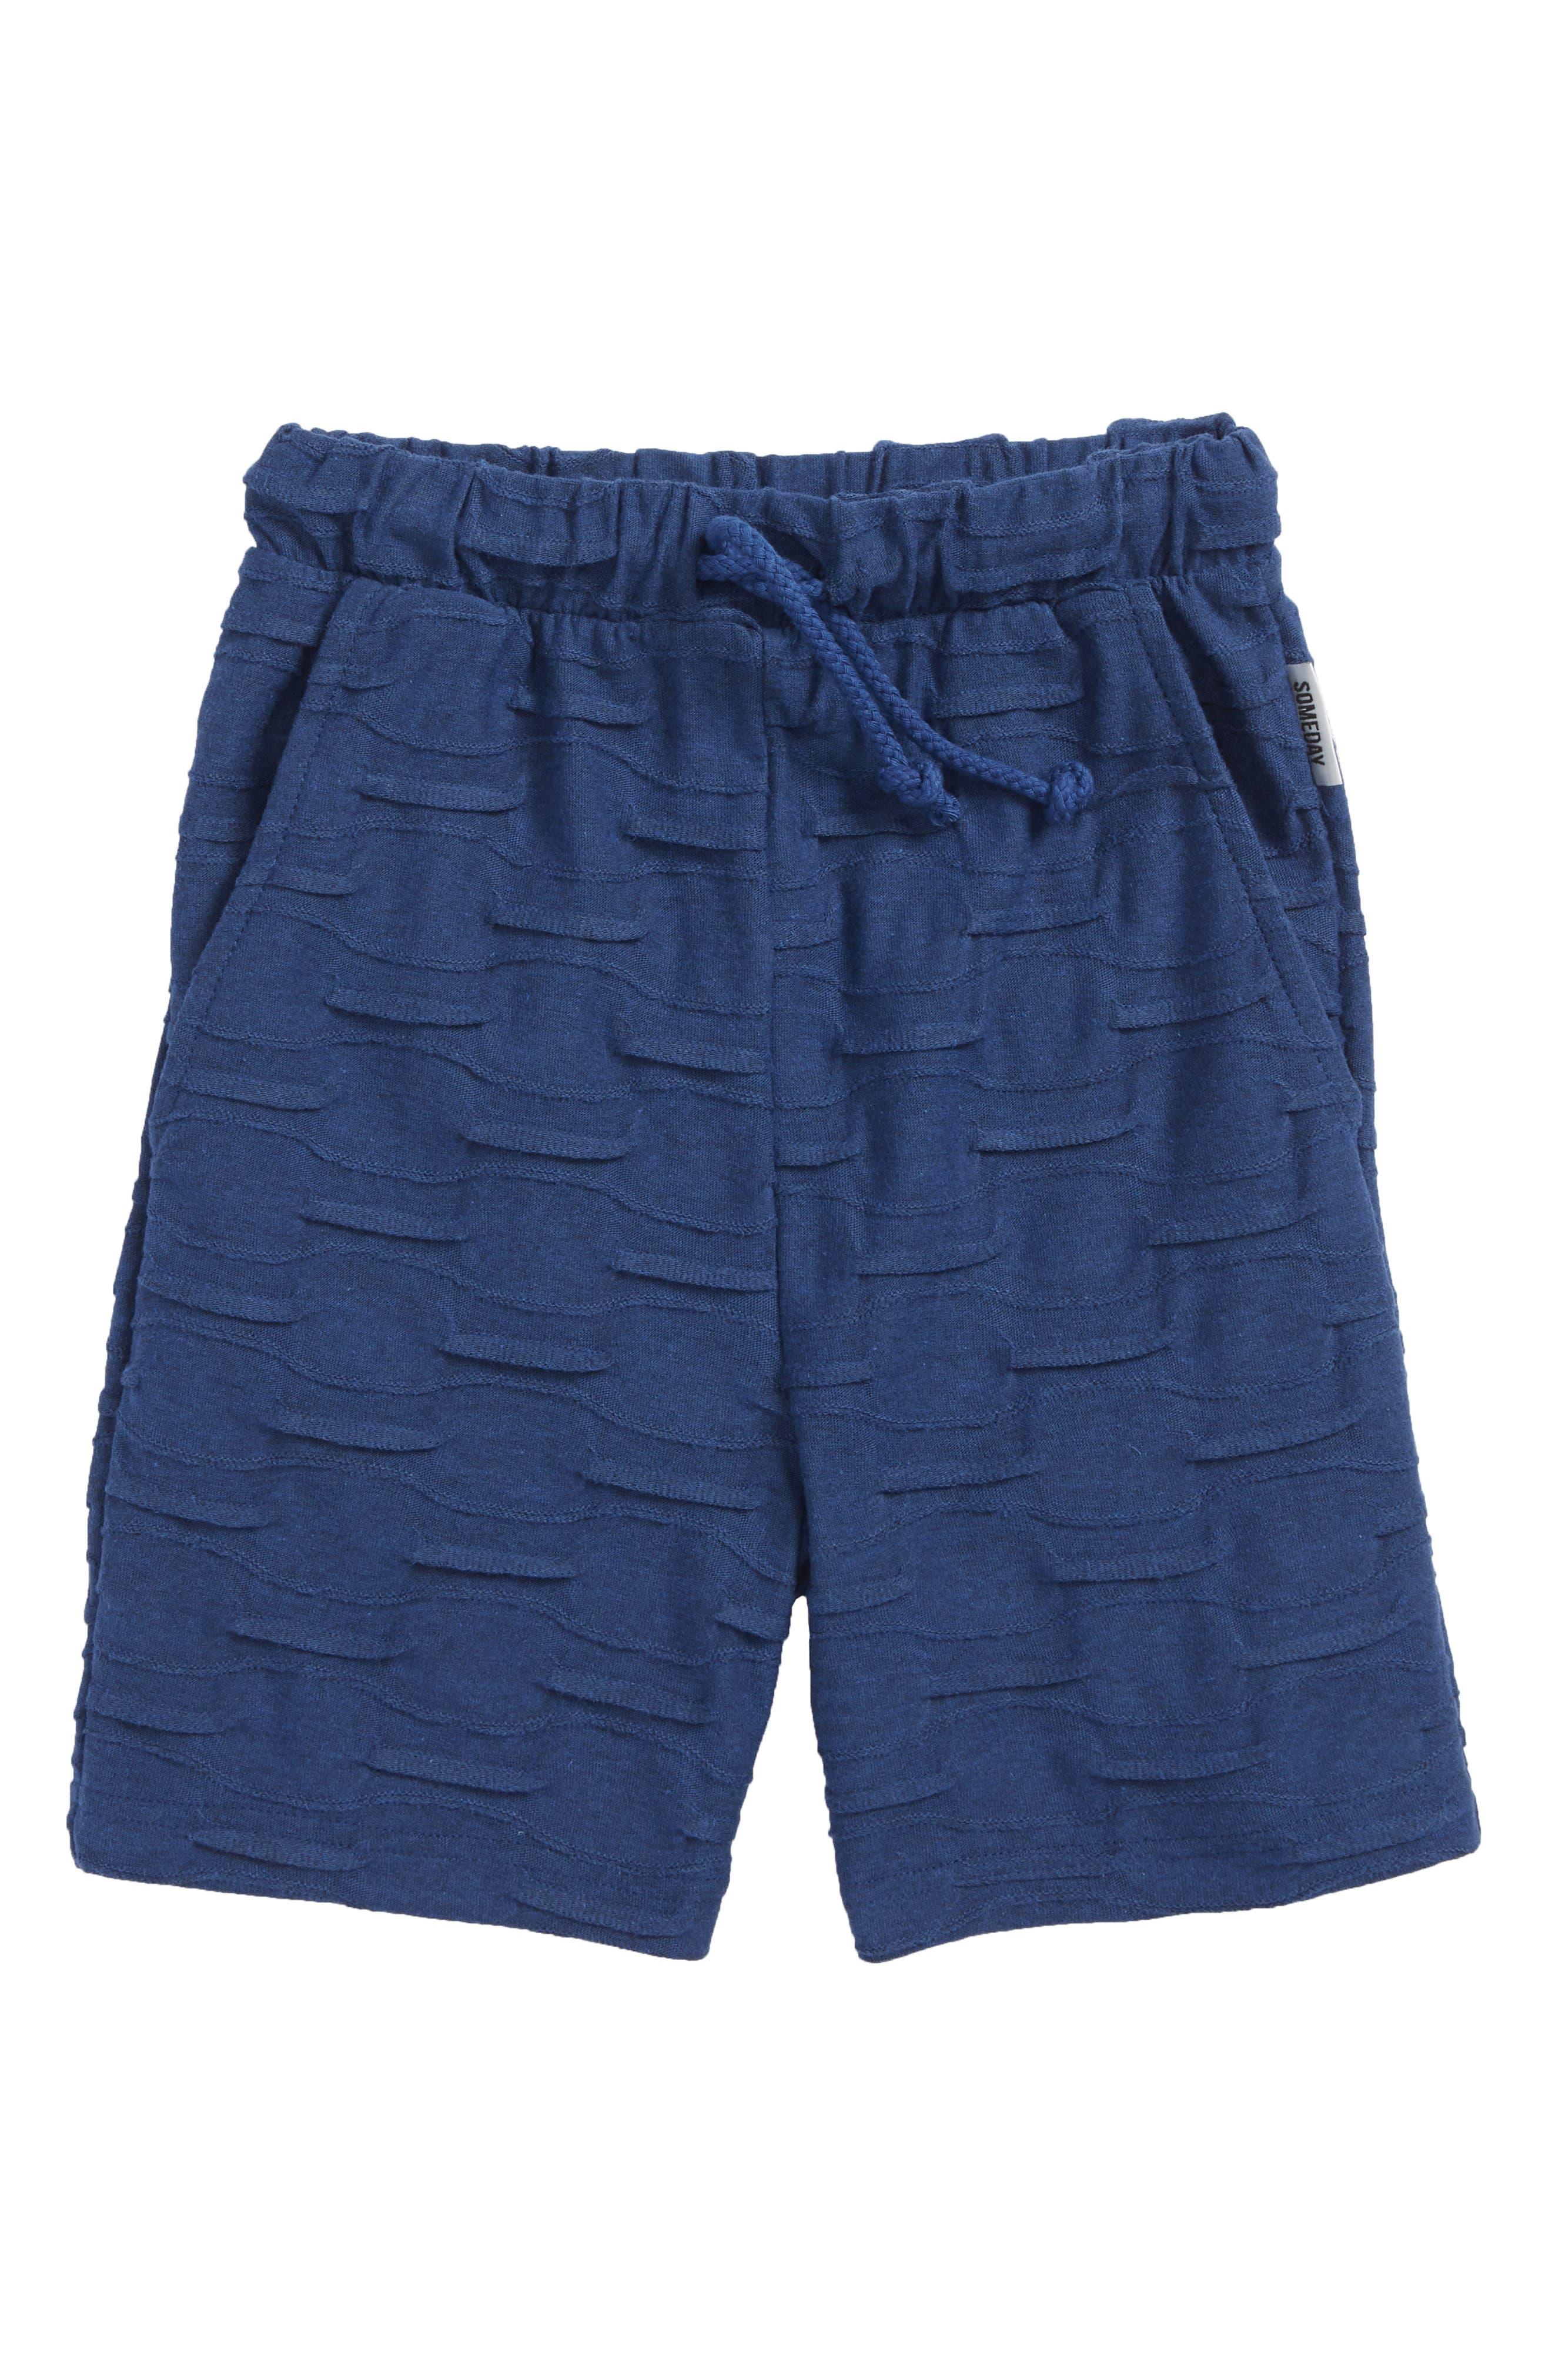 Cambria Shorts,                         Main,                         color, Blue